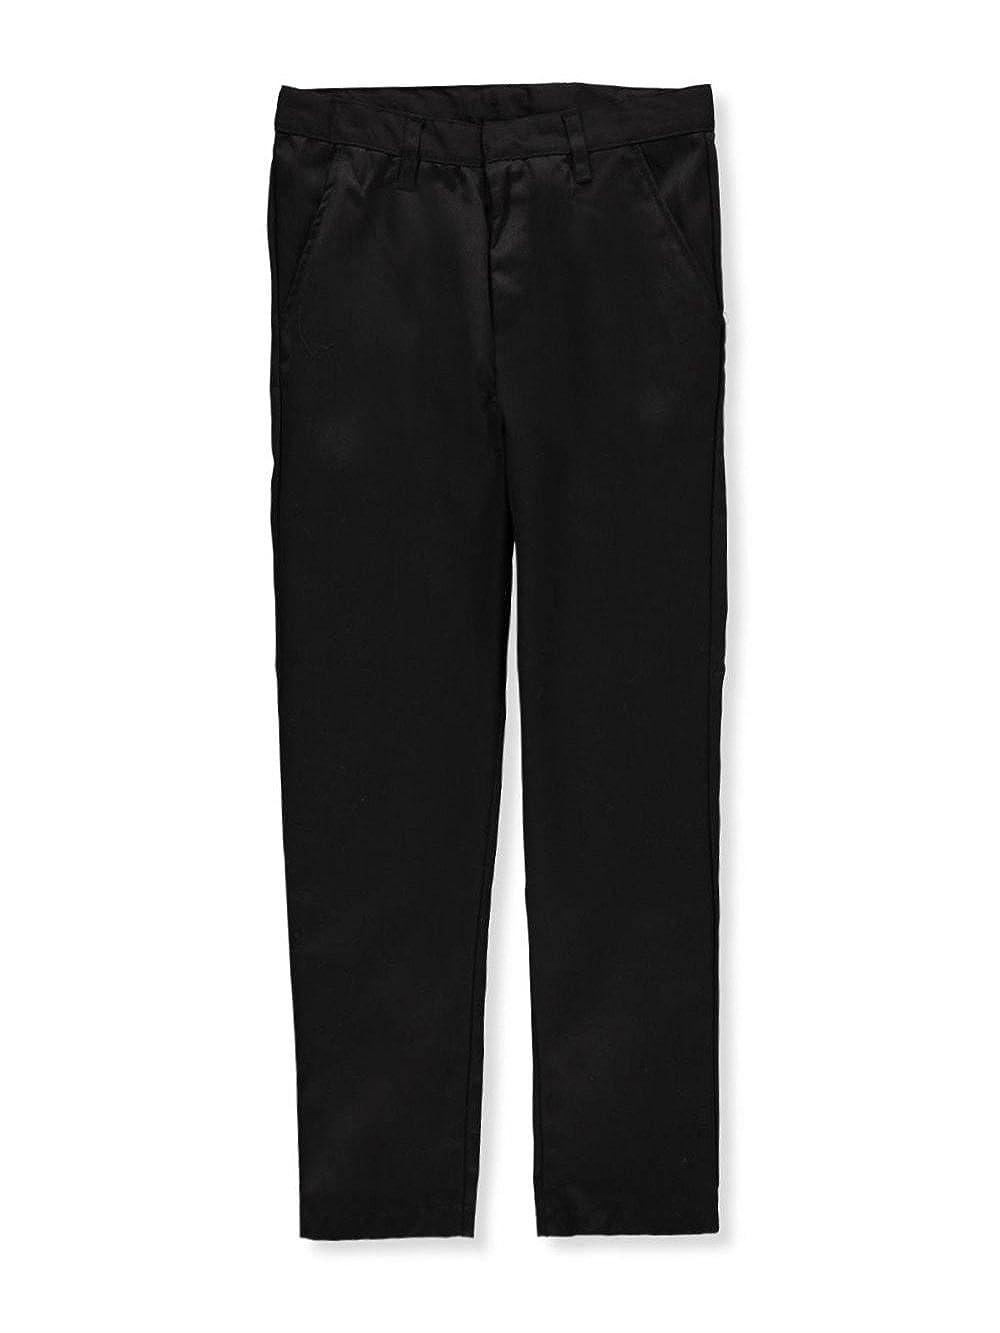 Black Galaxy Big Boys Flat Front School Uniform Pants 18